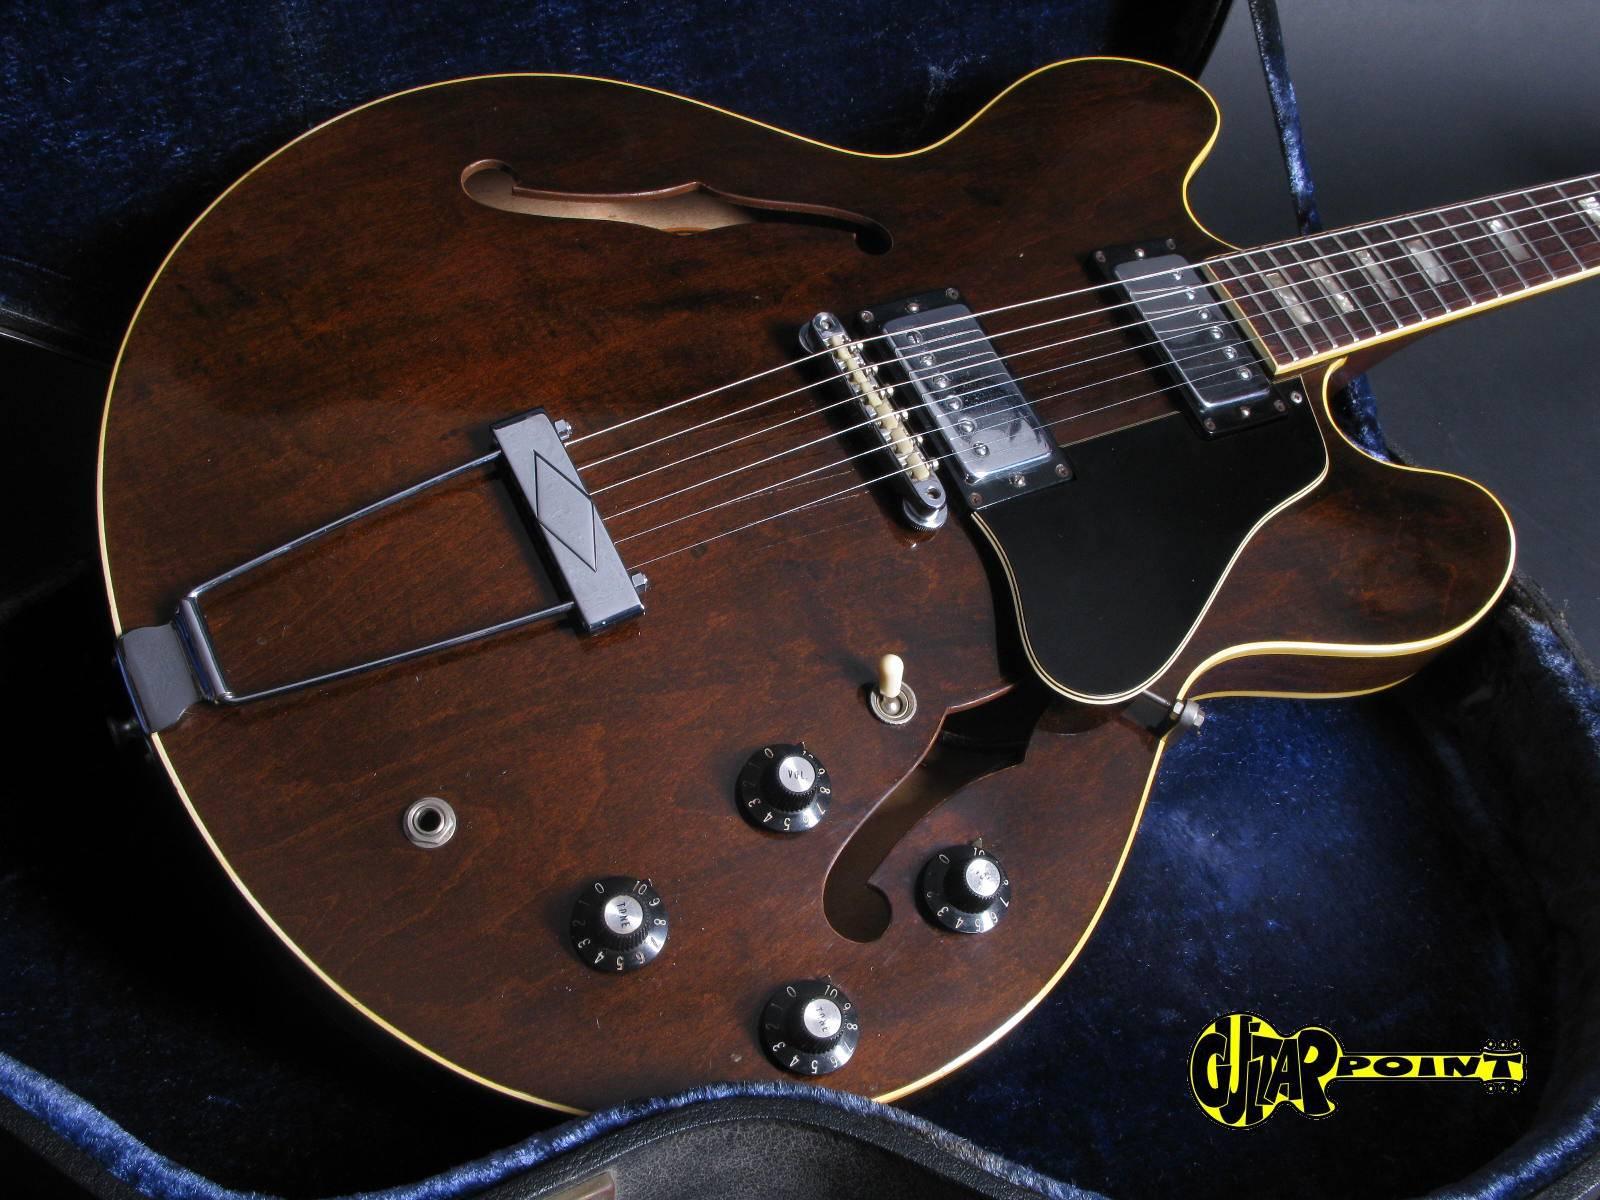 gibson es 335 1969 walnut guitar for sale guitarpoint. Black Bedroom Furniture Sets. Home Design Ideas